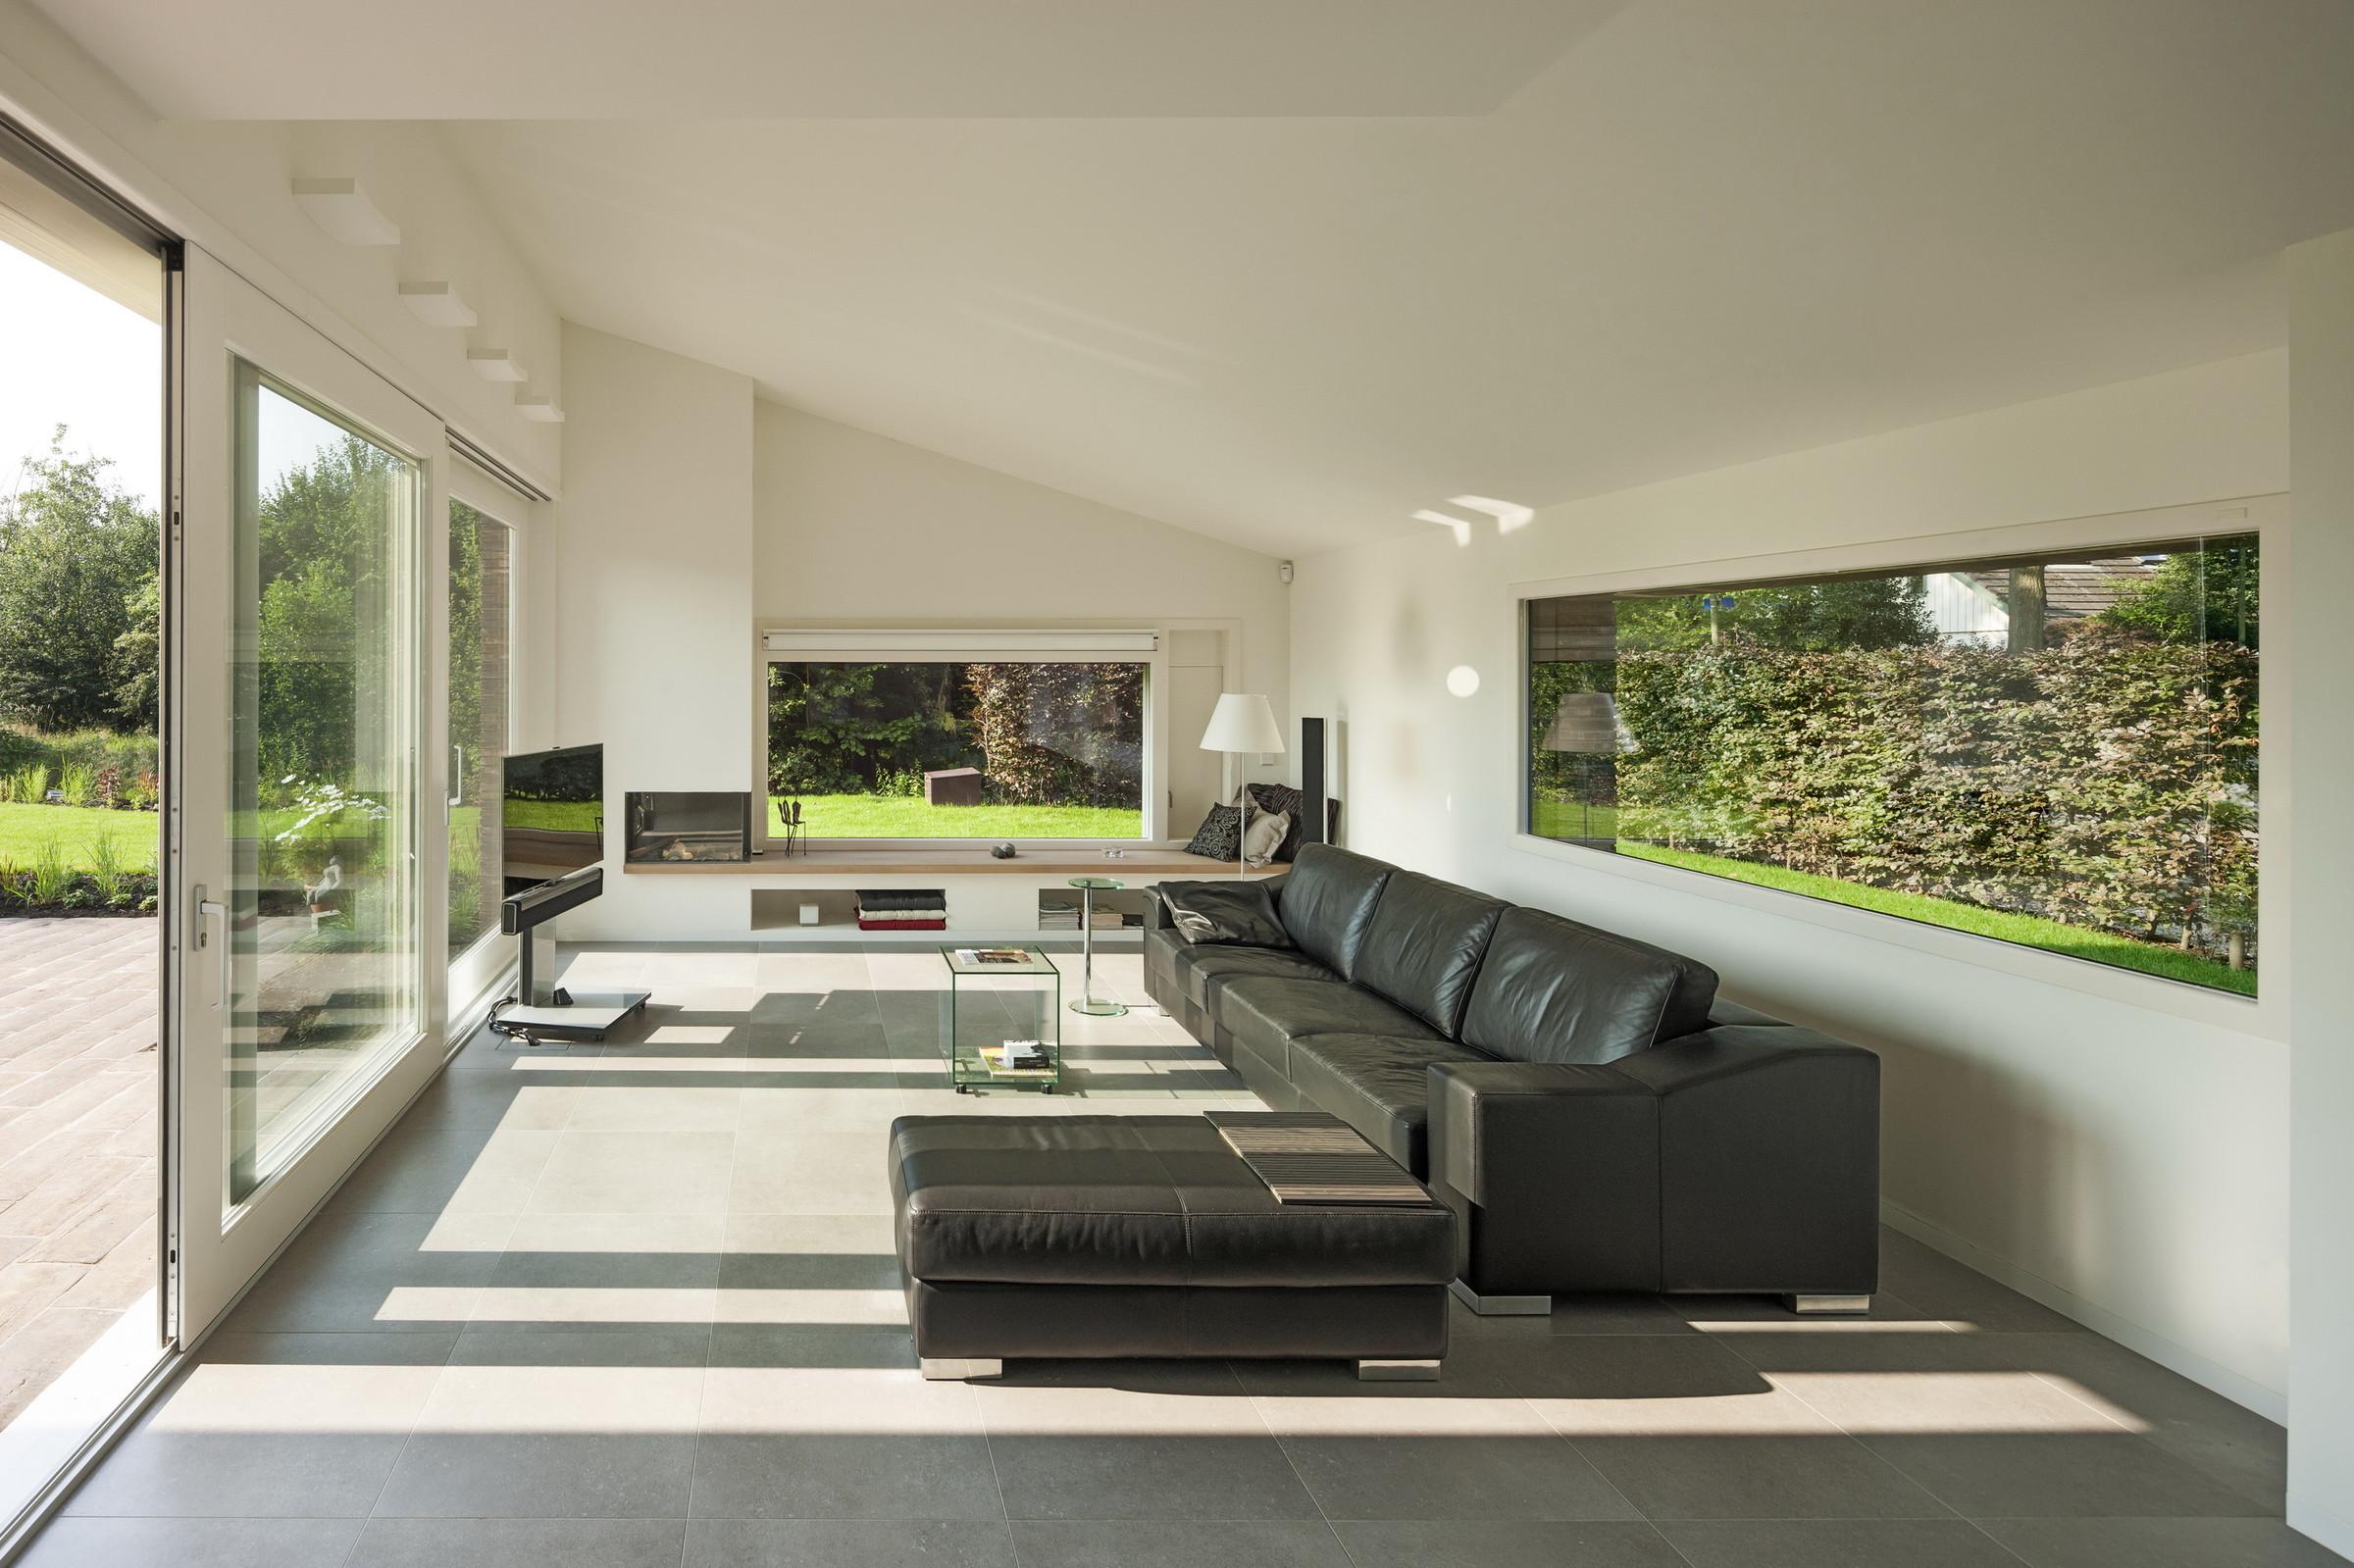 Baksteenhuis groenekan zecc architecten - Trap binnen villa ...